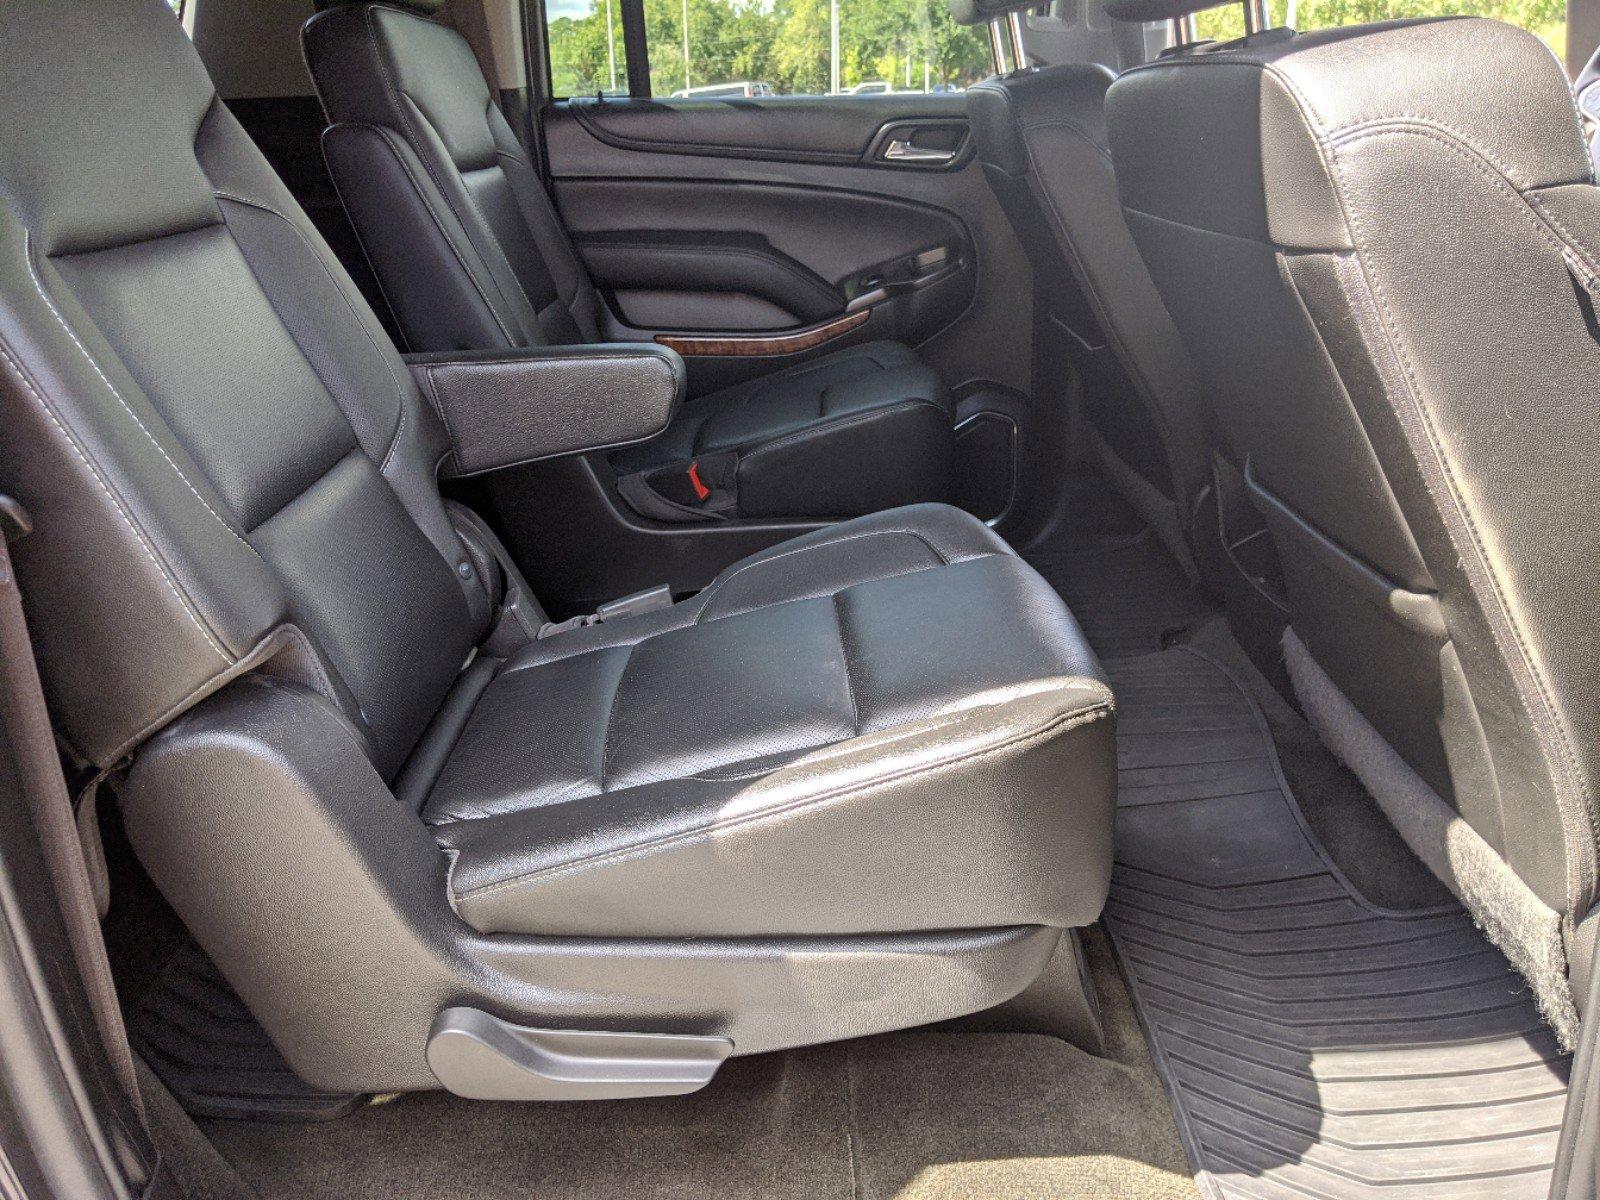 Certified Pre-Owned 2017 Chevrolet Suburban Premier